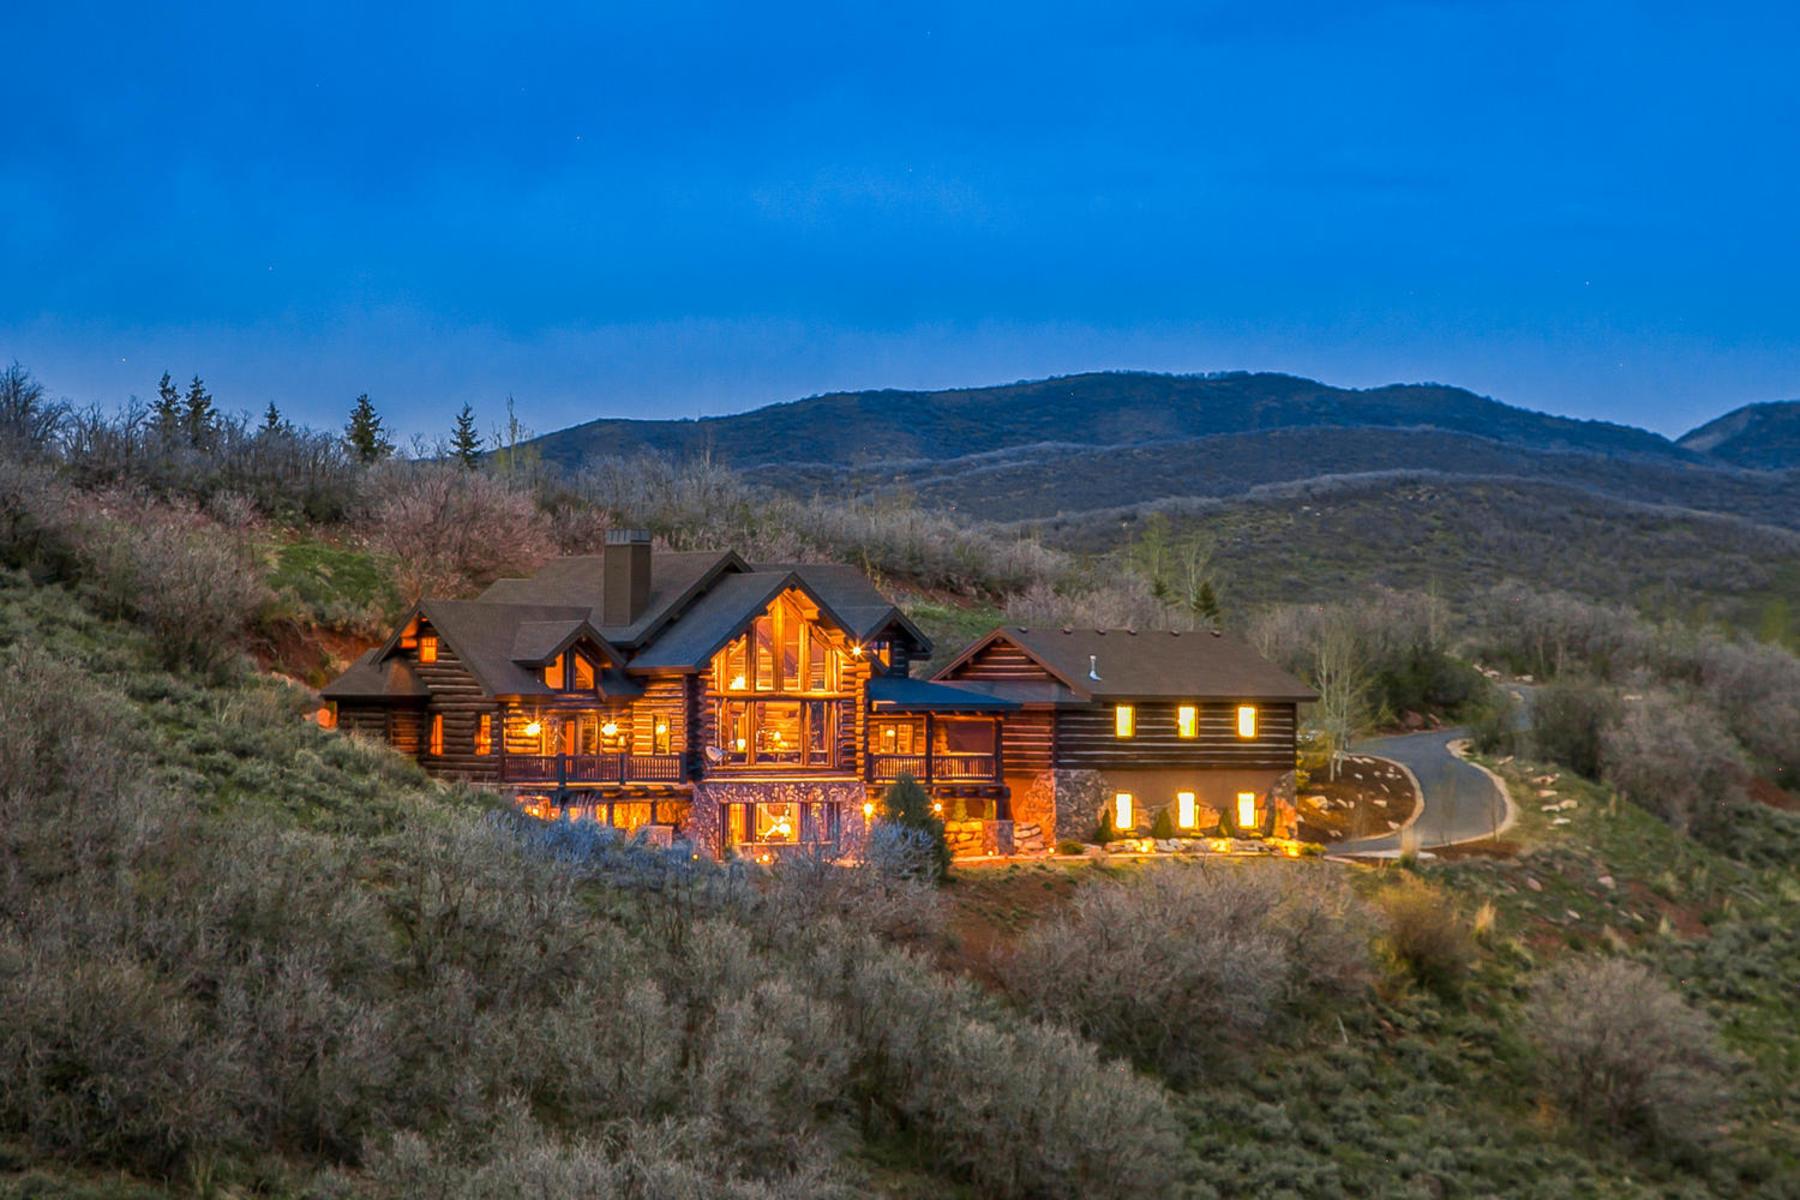 Moradia para Venda às Simply Stunning Mountain Home 4115 Moose Hollow Dr Park City, Utah 84098 Estados Unidos